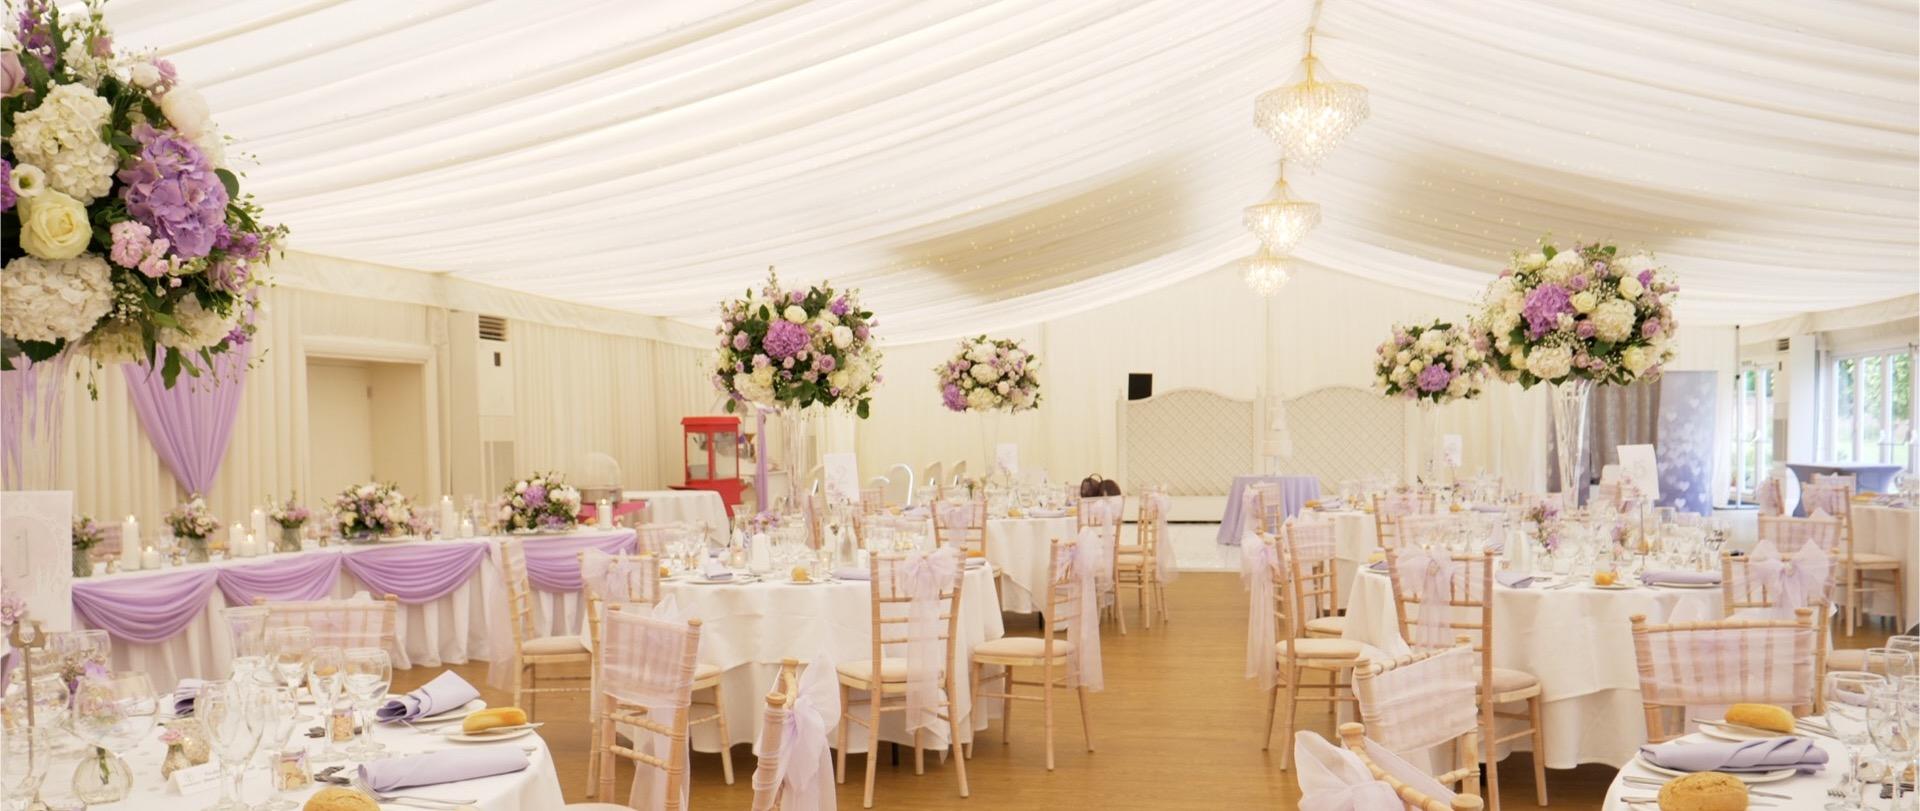 Wedding Breakfast at Quendon Hall Video.jpg